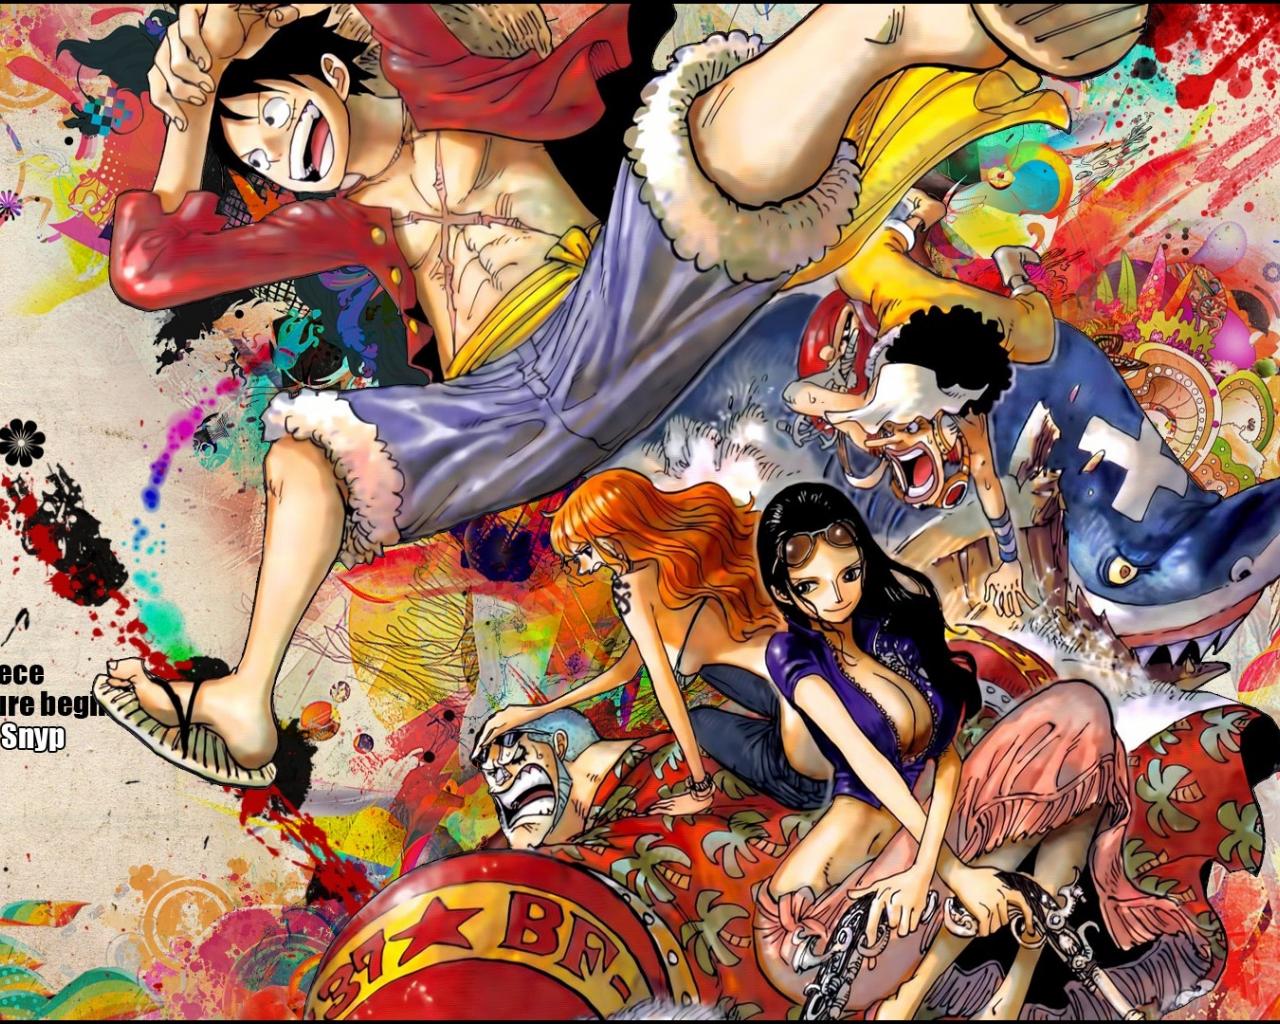 Free download fond ecran hd manga one piece wallpaper ...